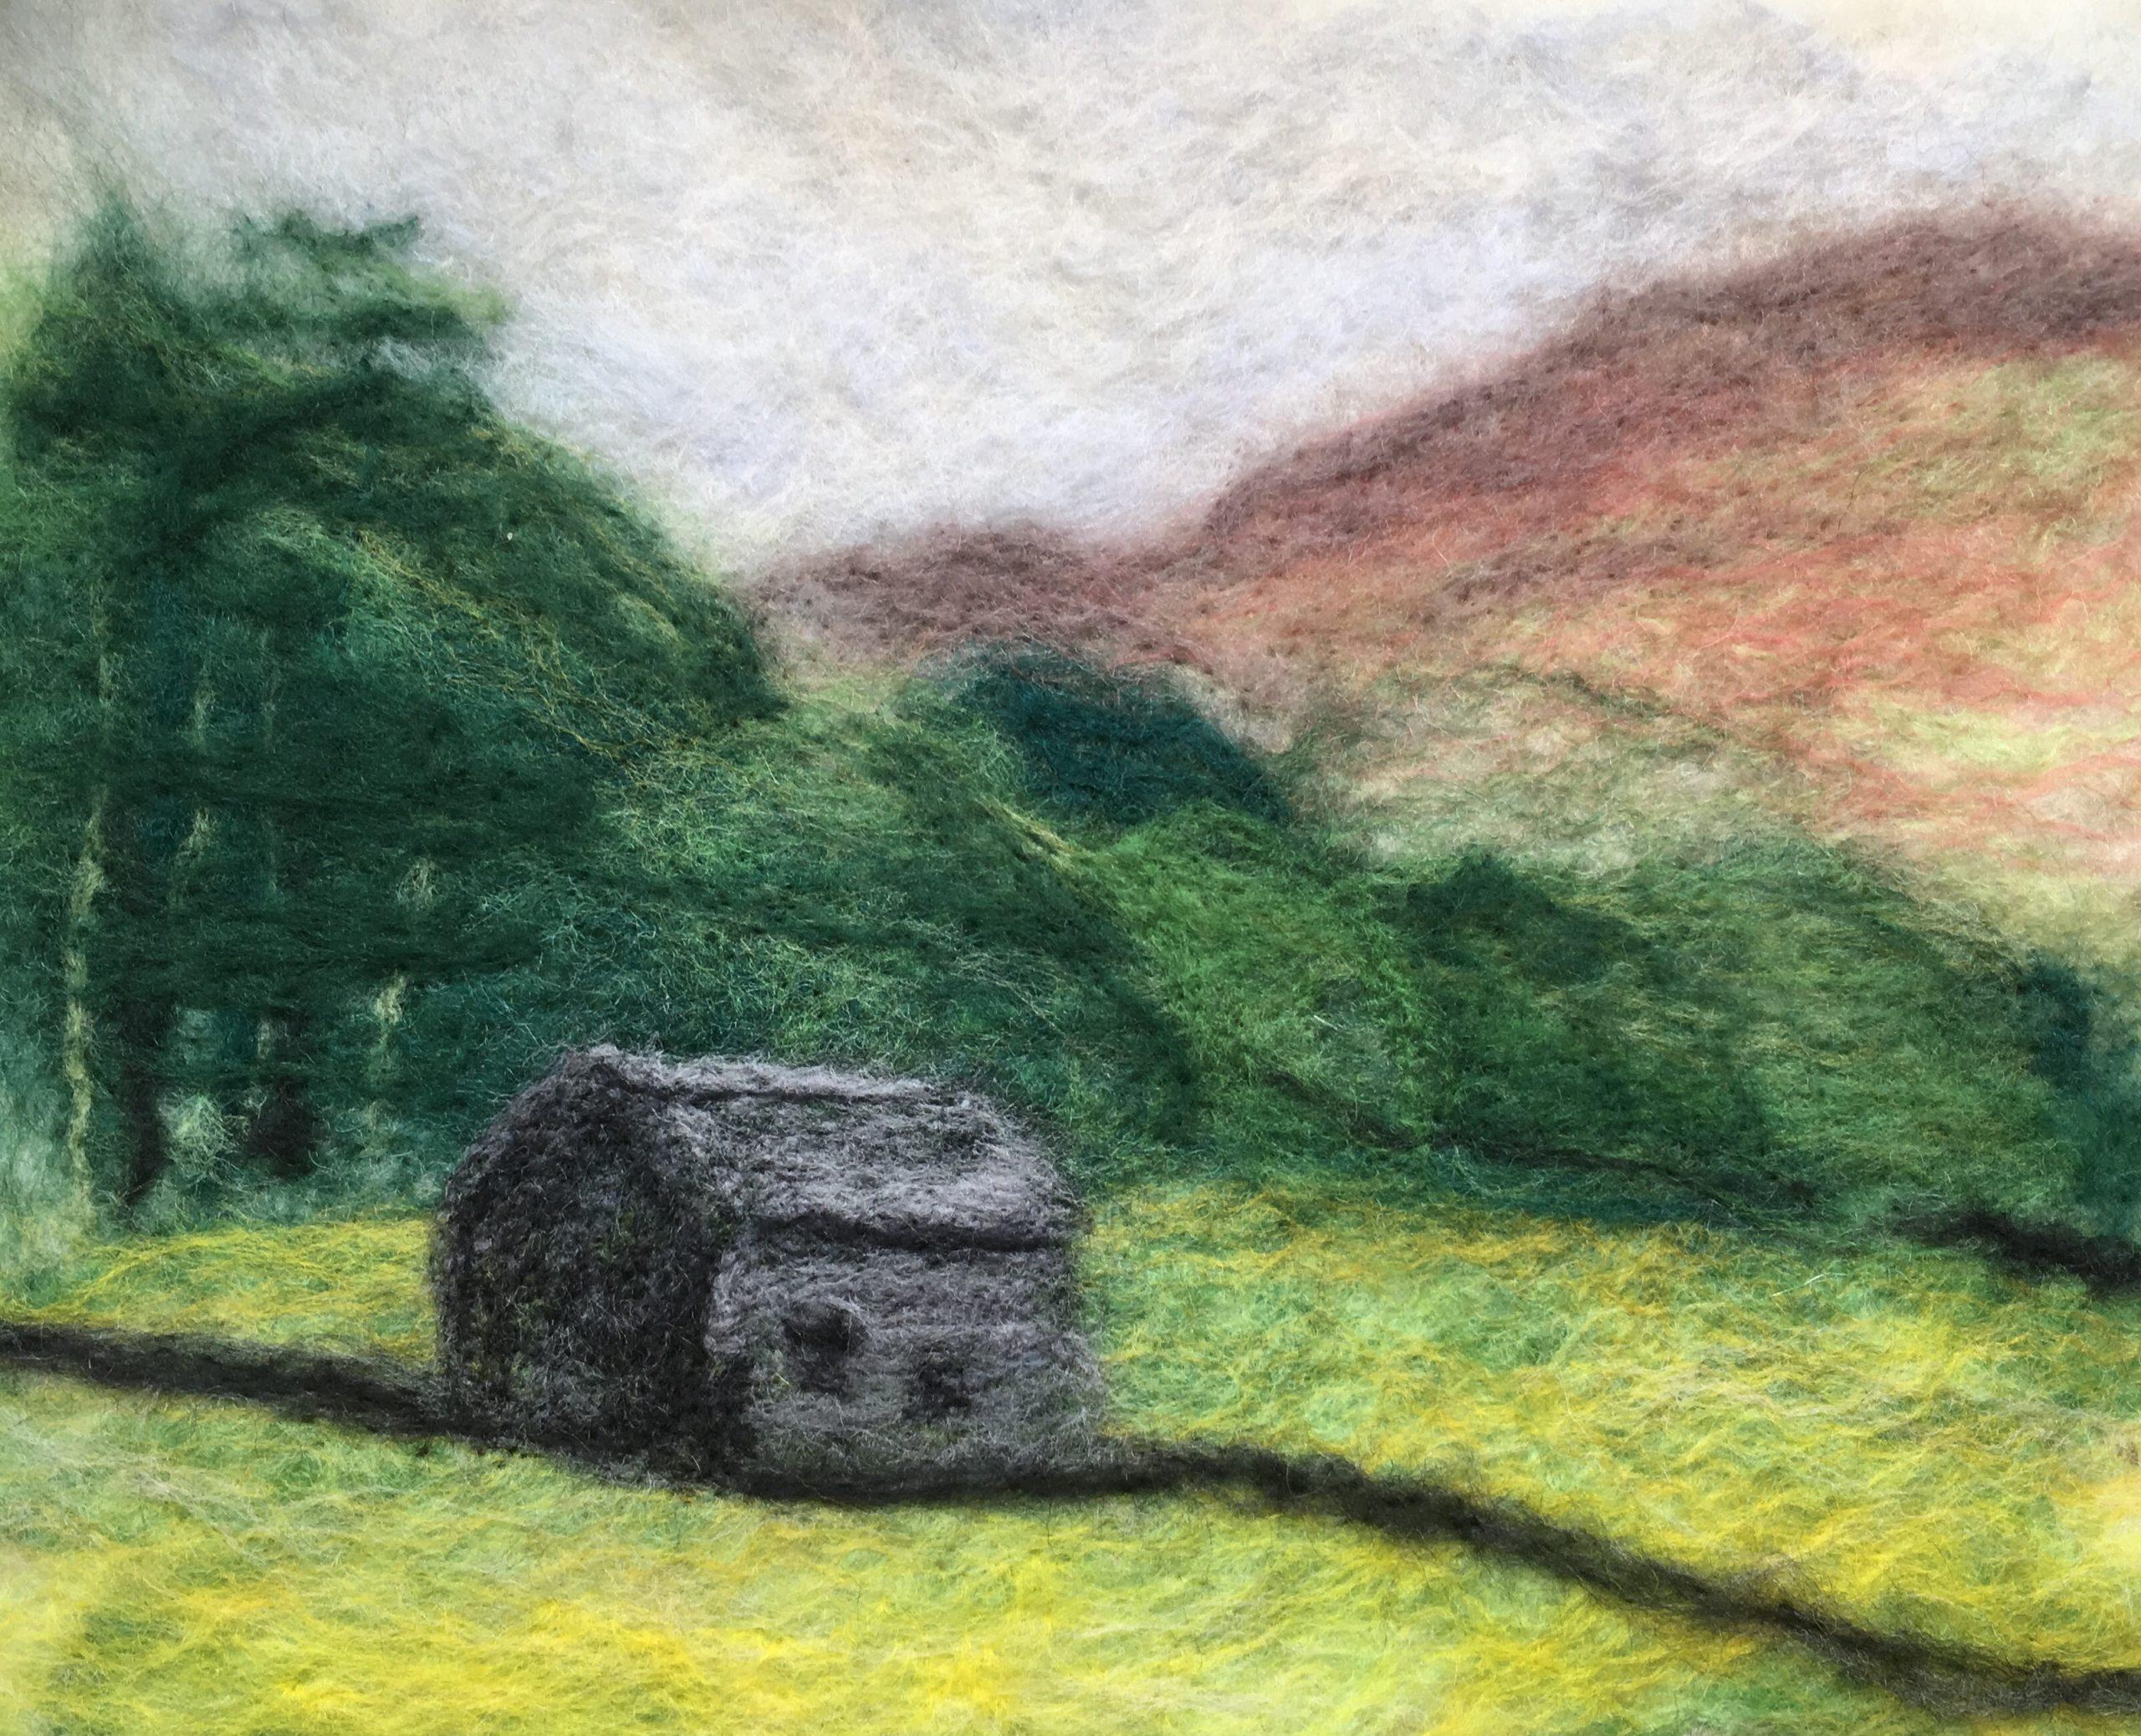 Muker Hay Meadows